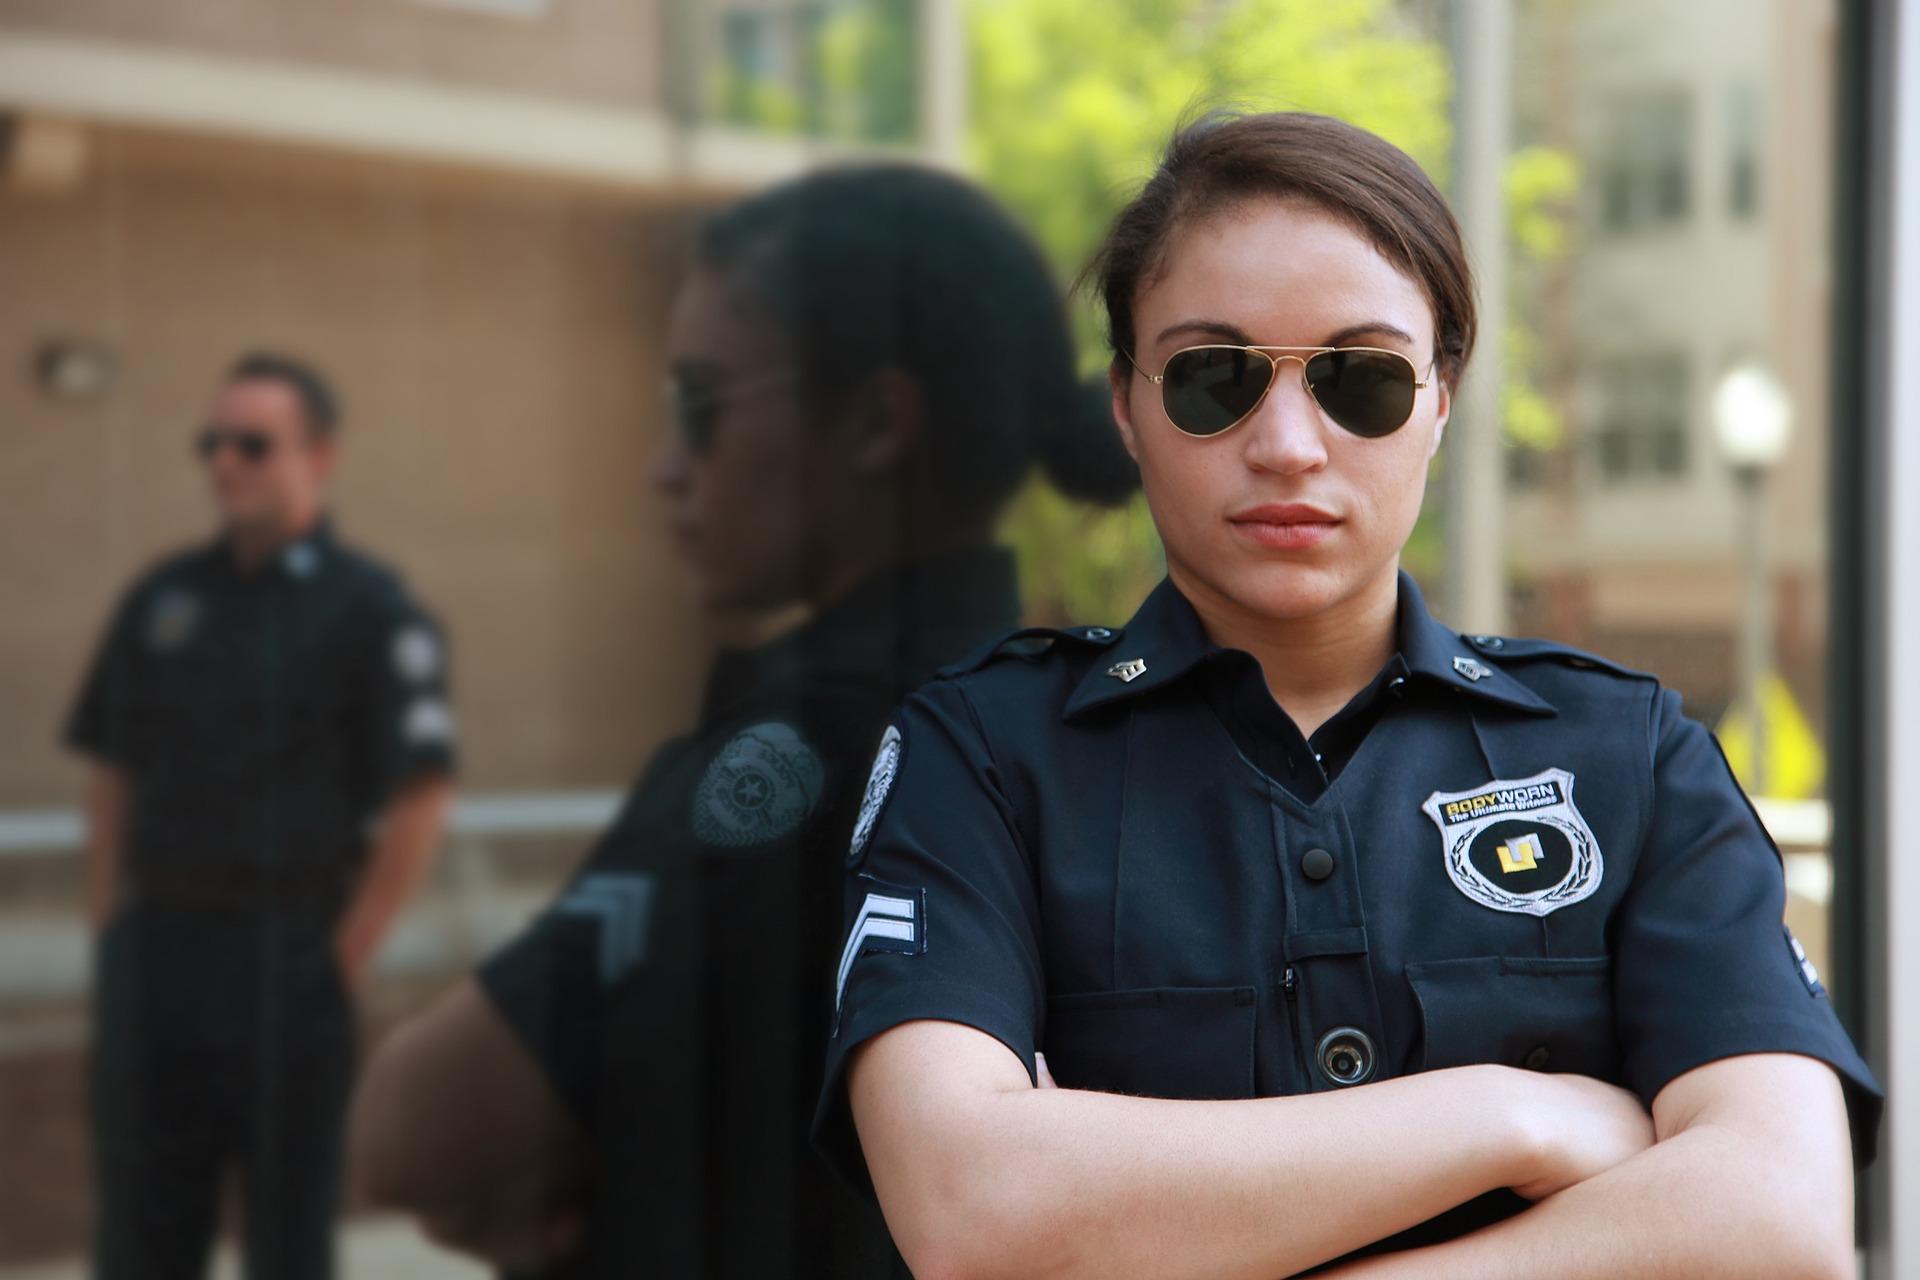 Security Patrol Officer